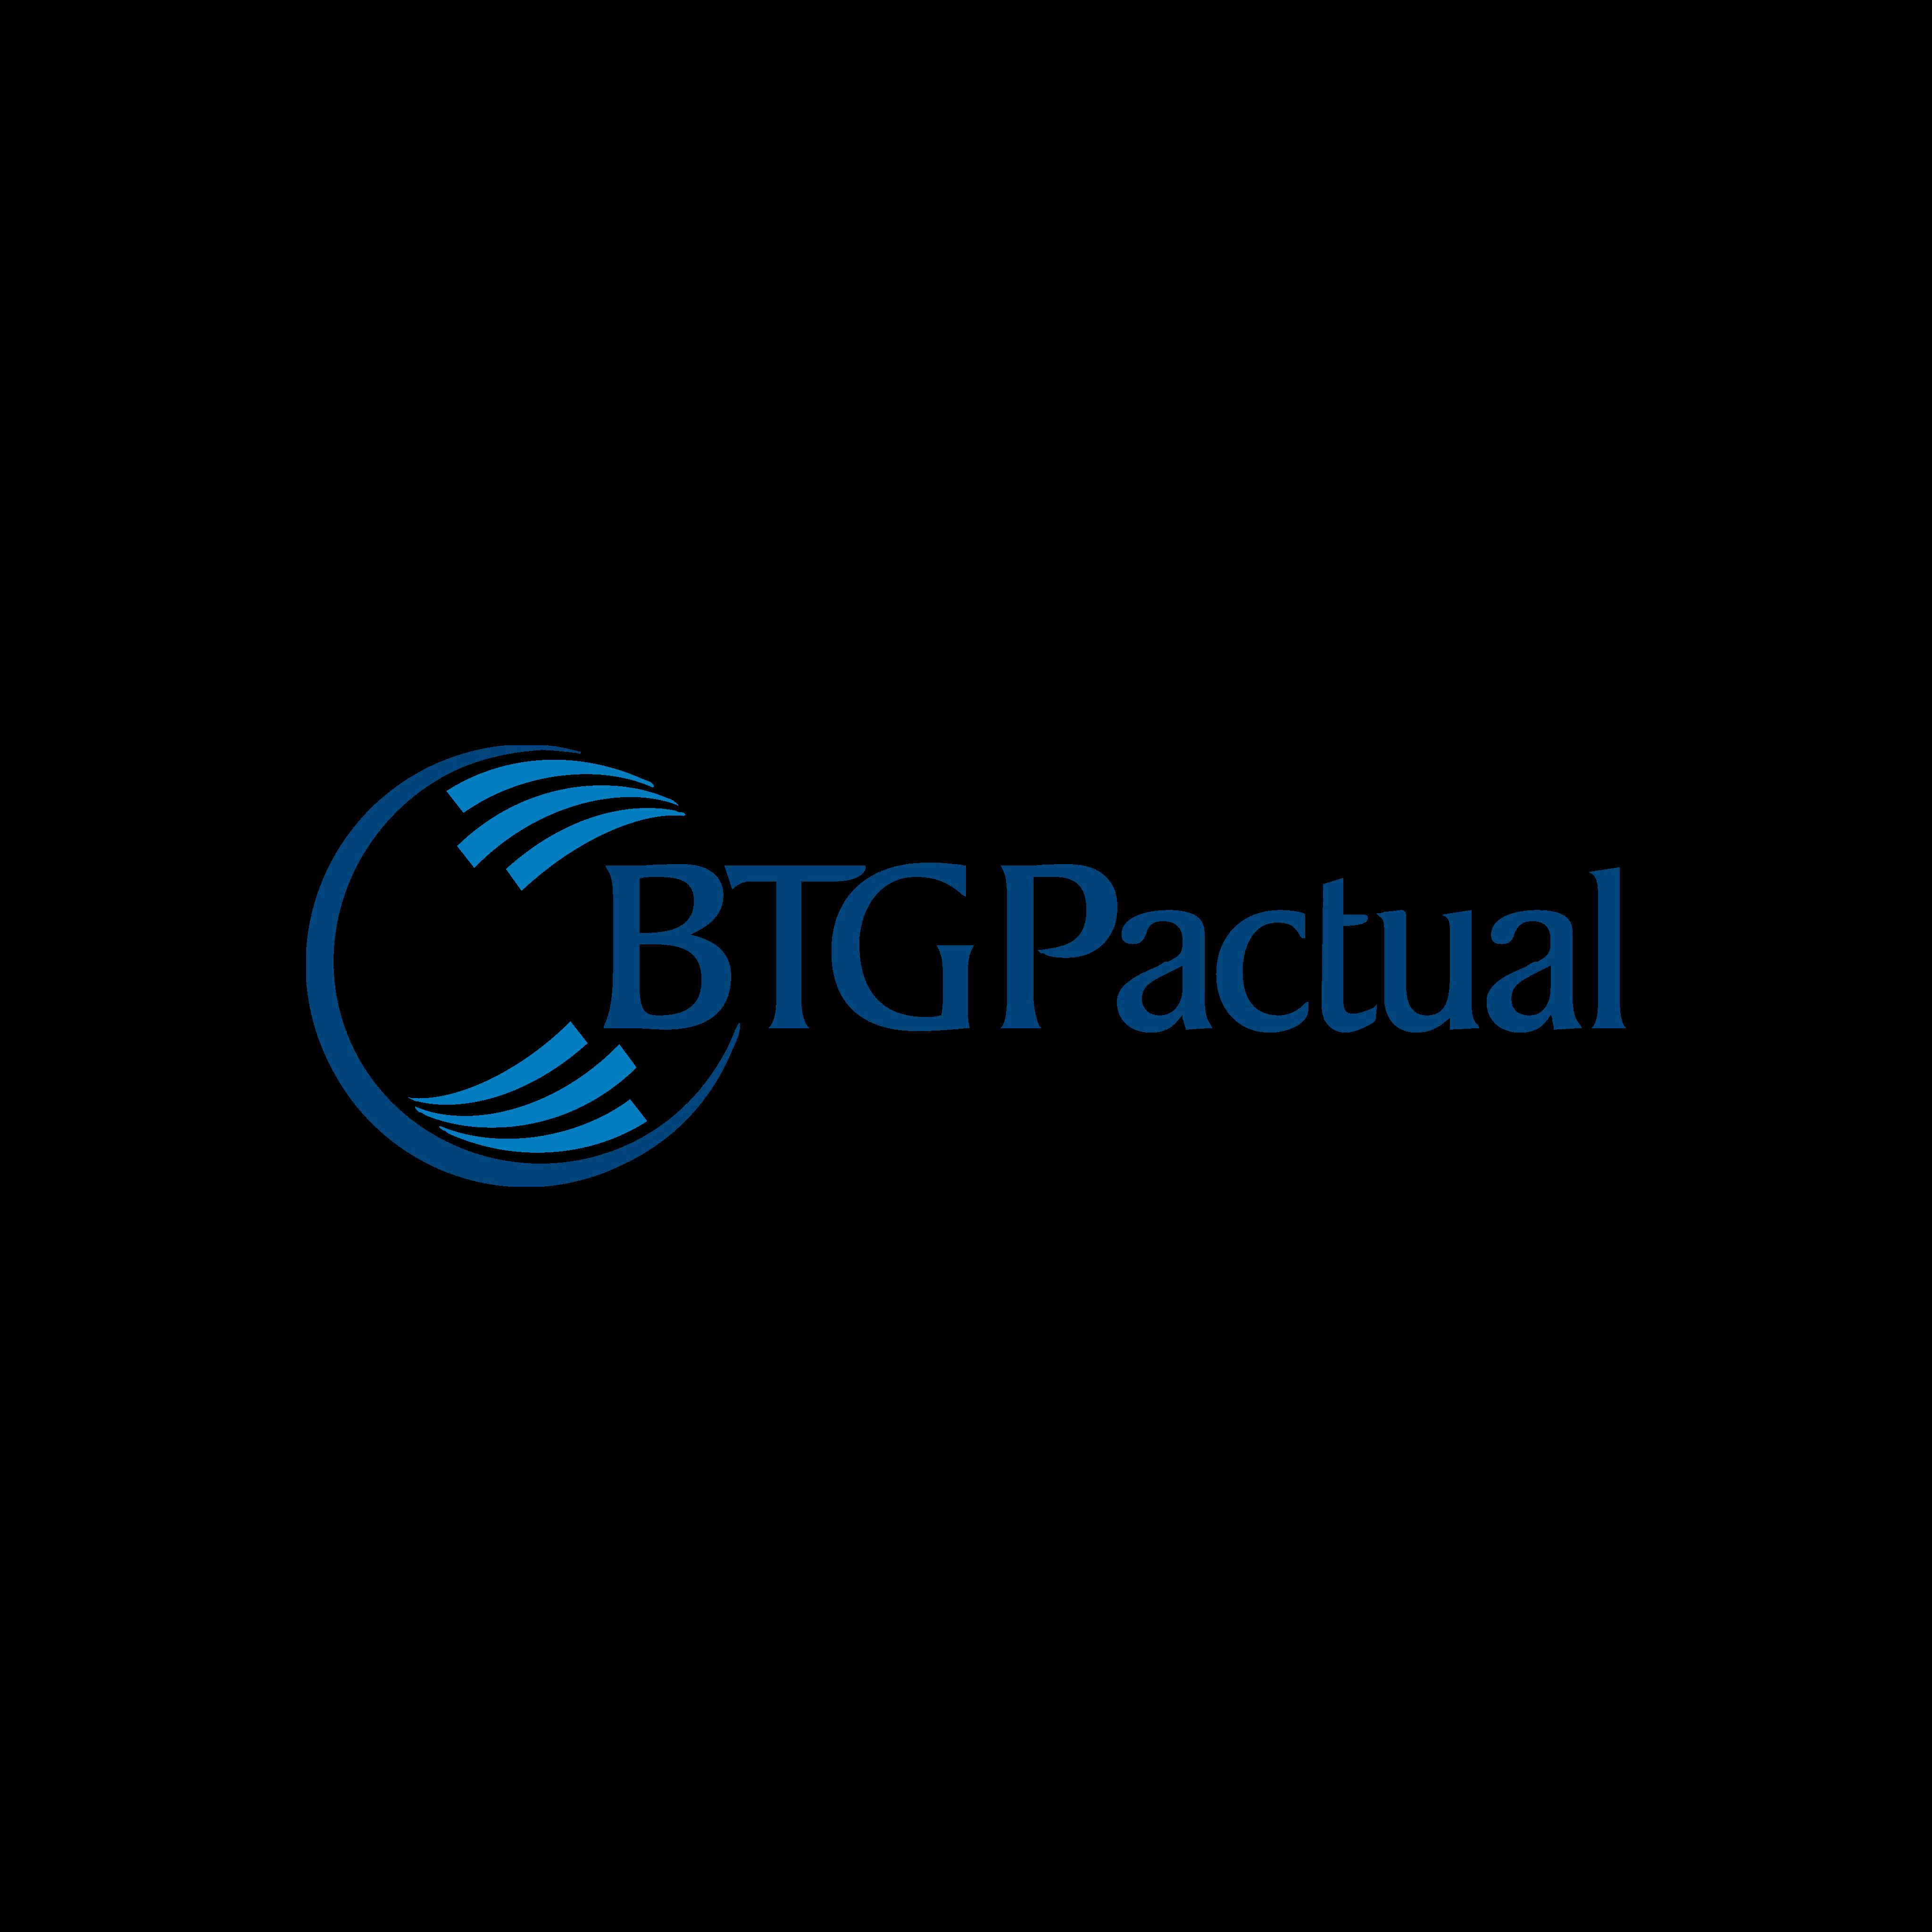 btg pactual logo 0 - BTG Pactual Logo